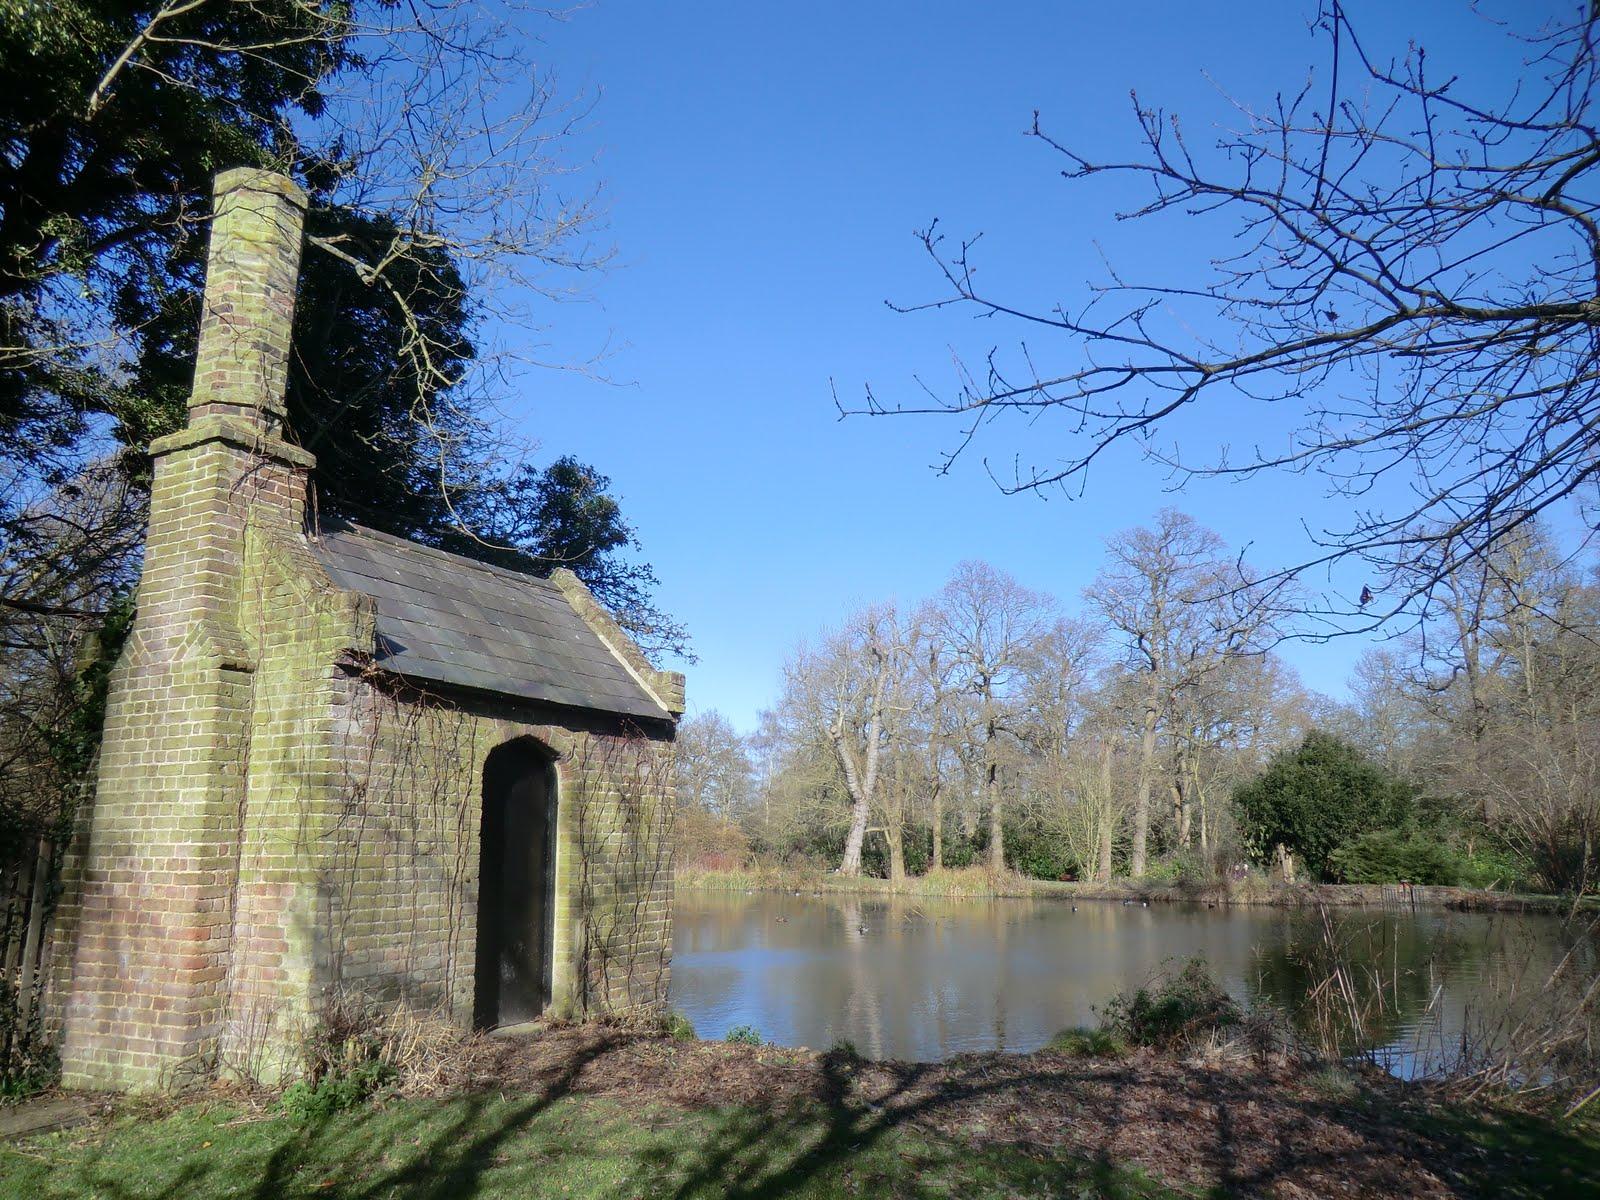 CIMG6736 The Water House, Waterhouse Pond